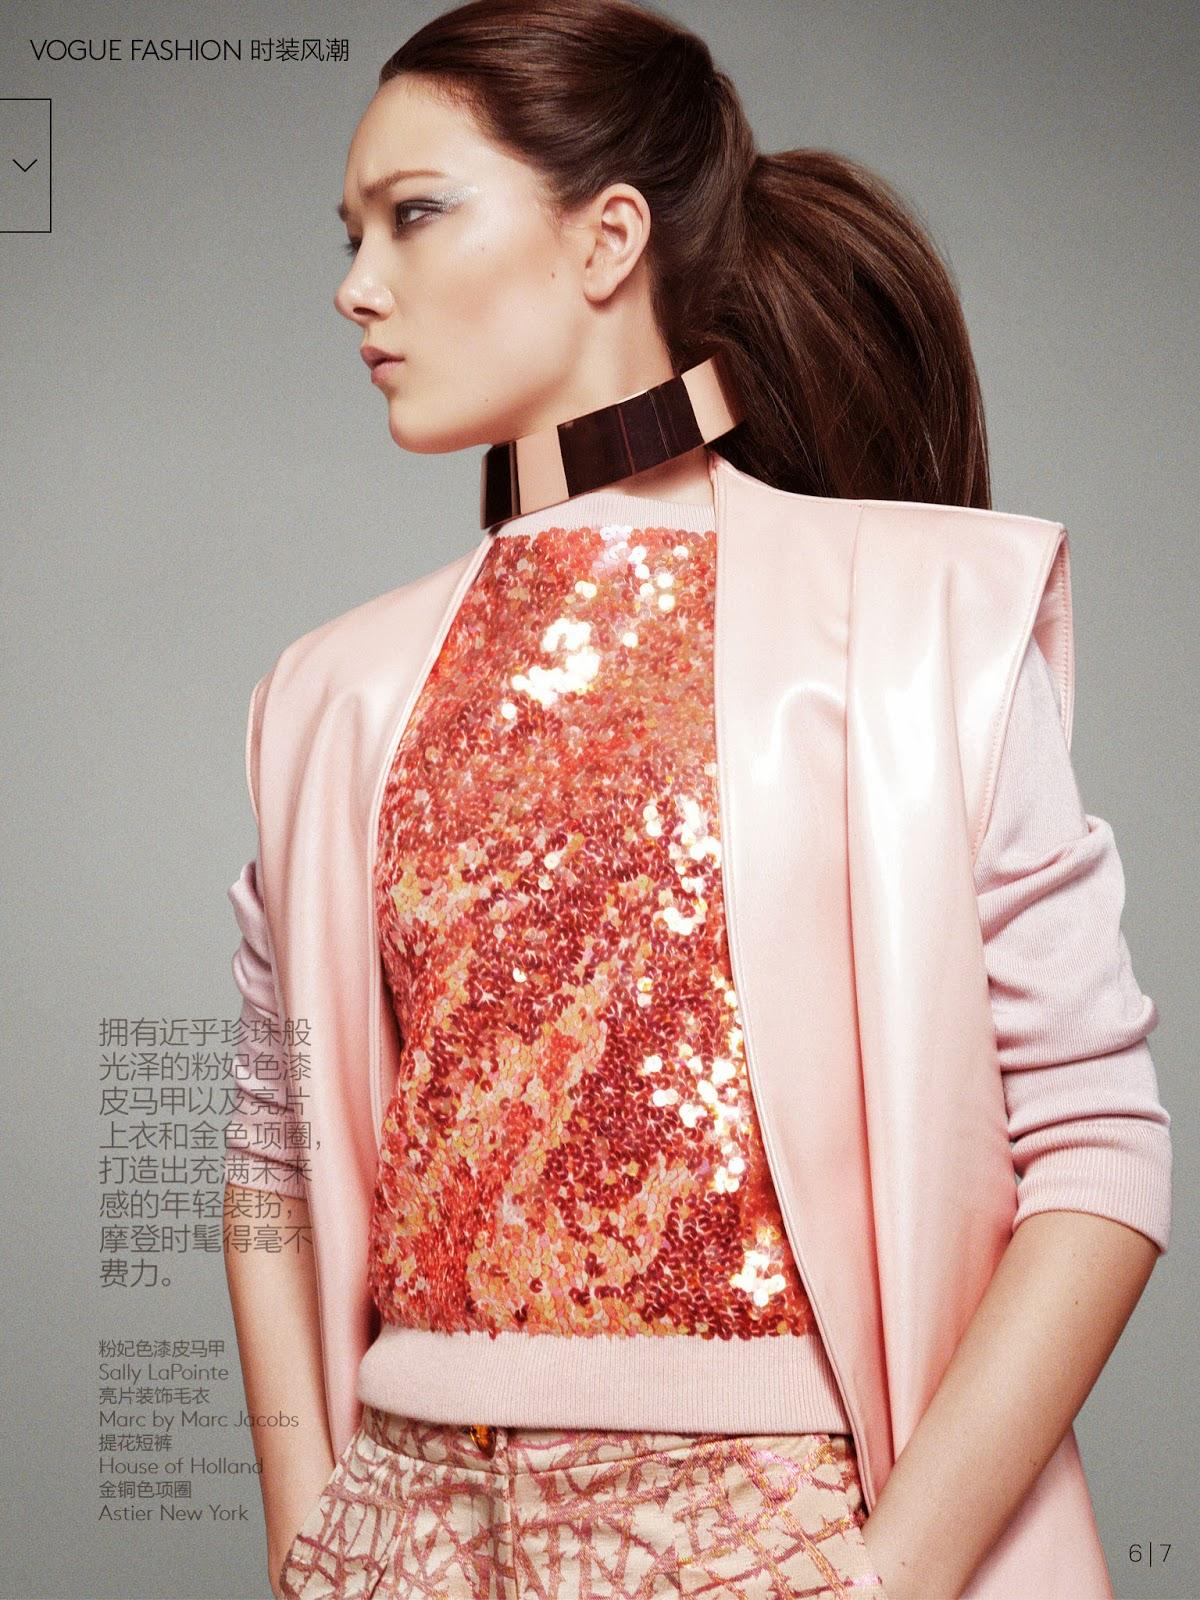 Yumi Lambert HQ Pictures Vogue China Magazine Photoshoot March 2014